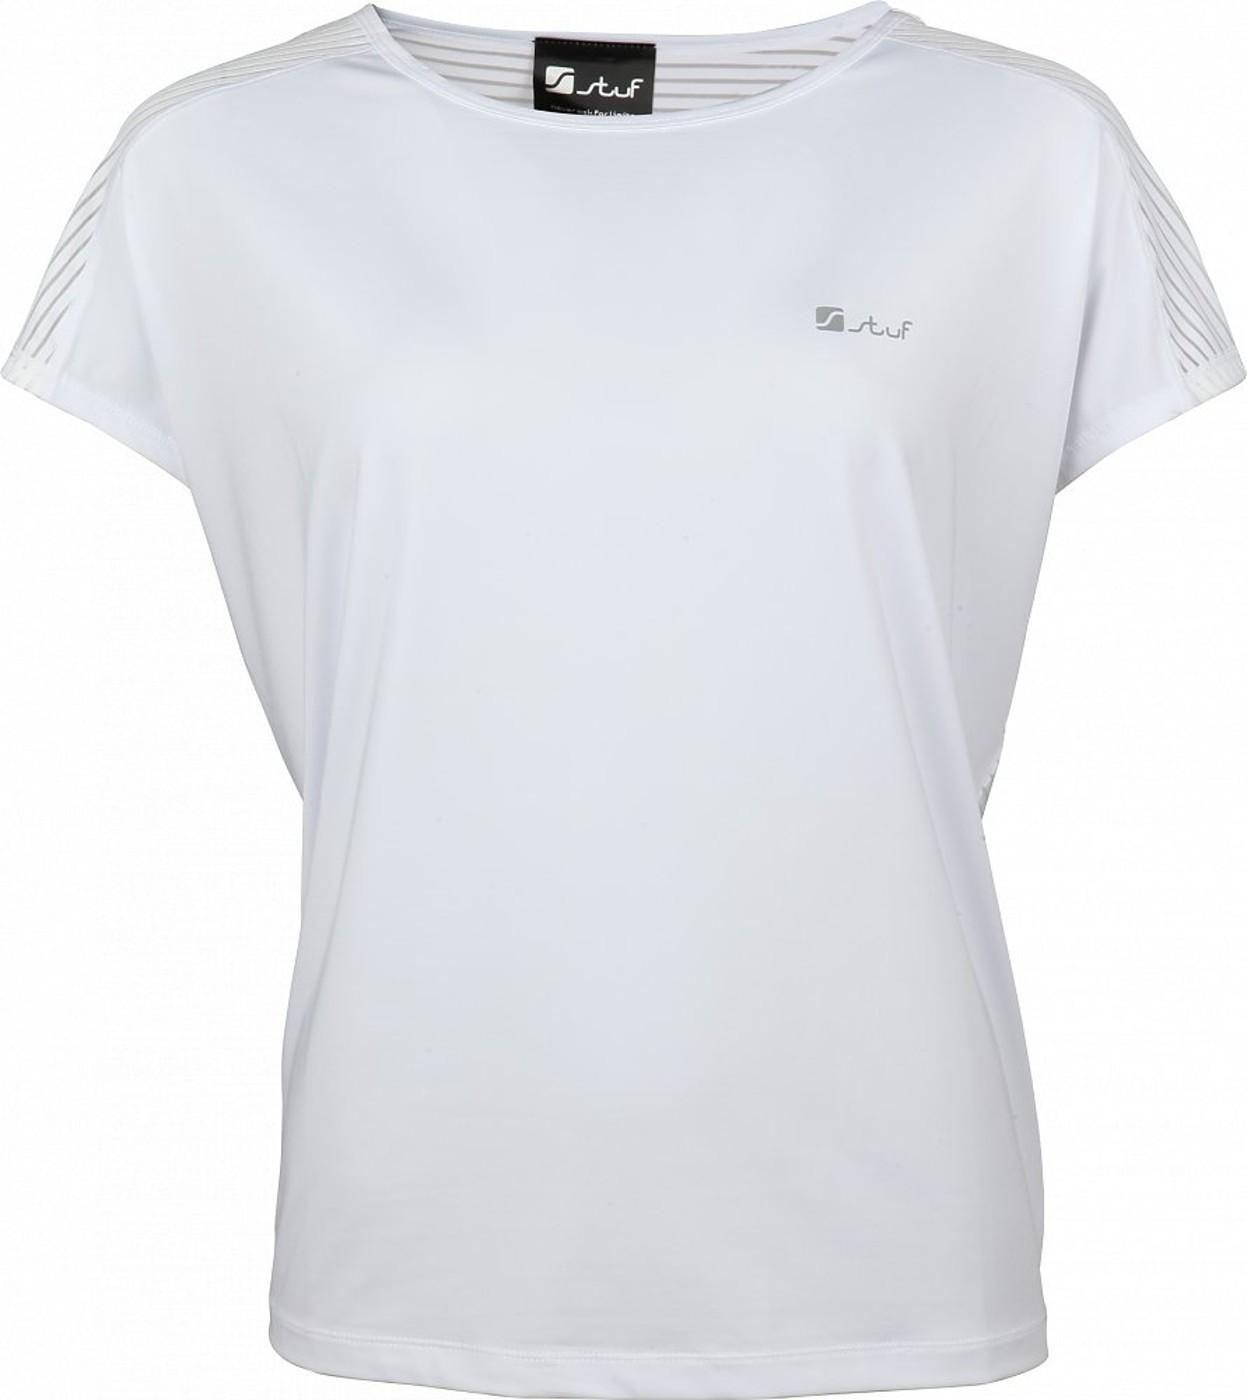 STUF OLIVIA T-Shirt - Damen